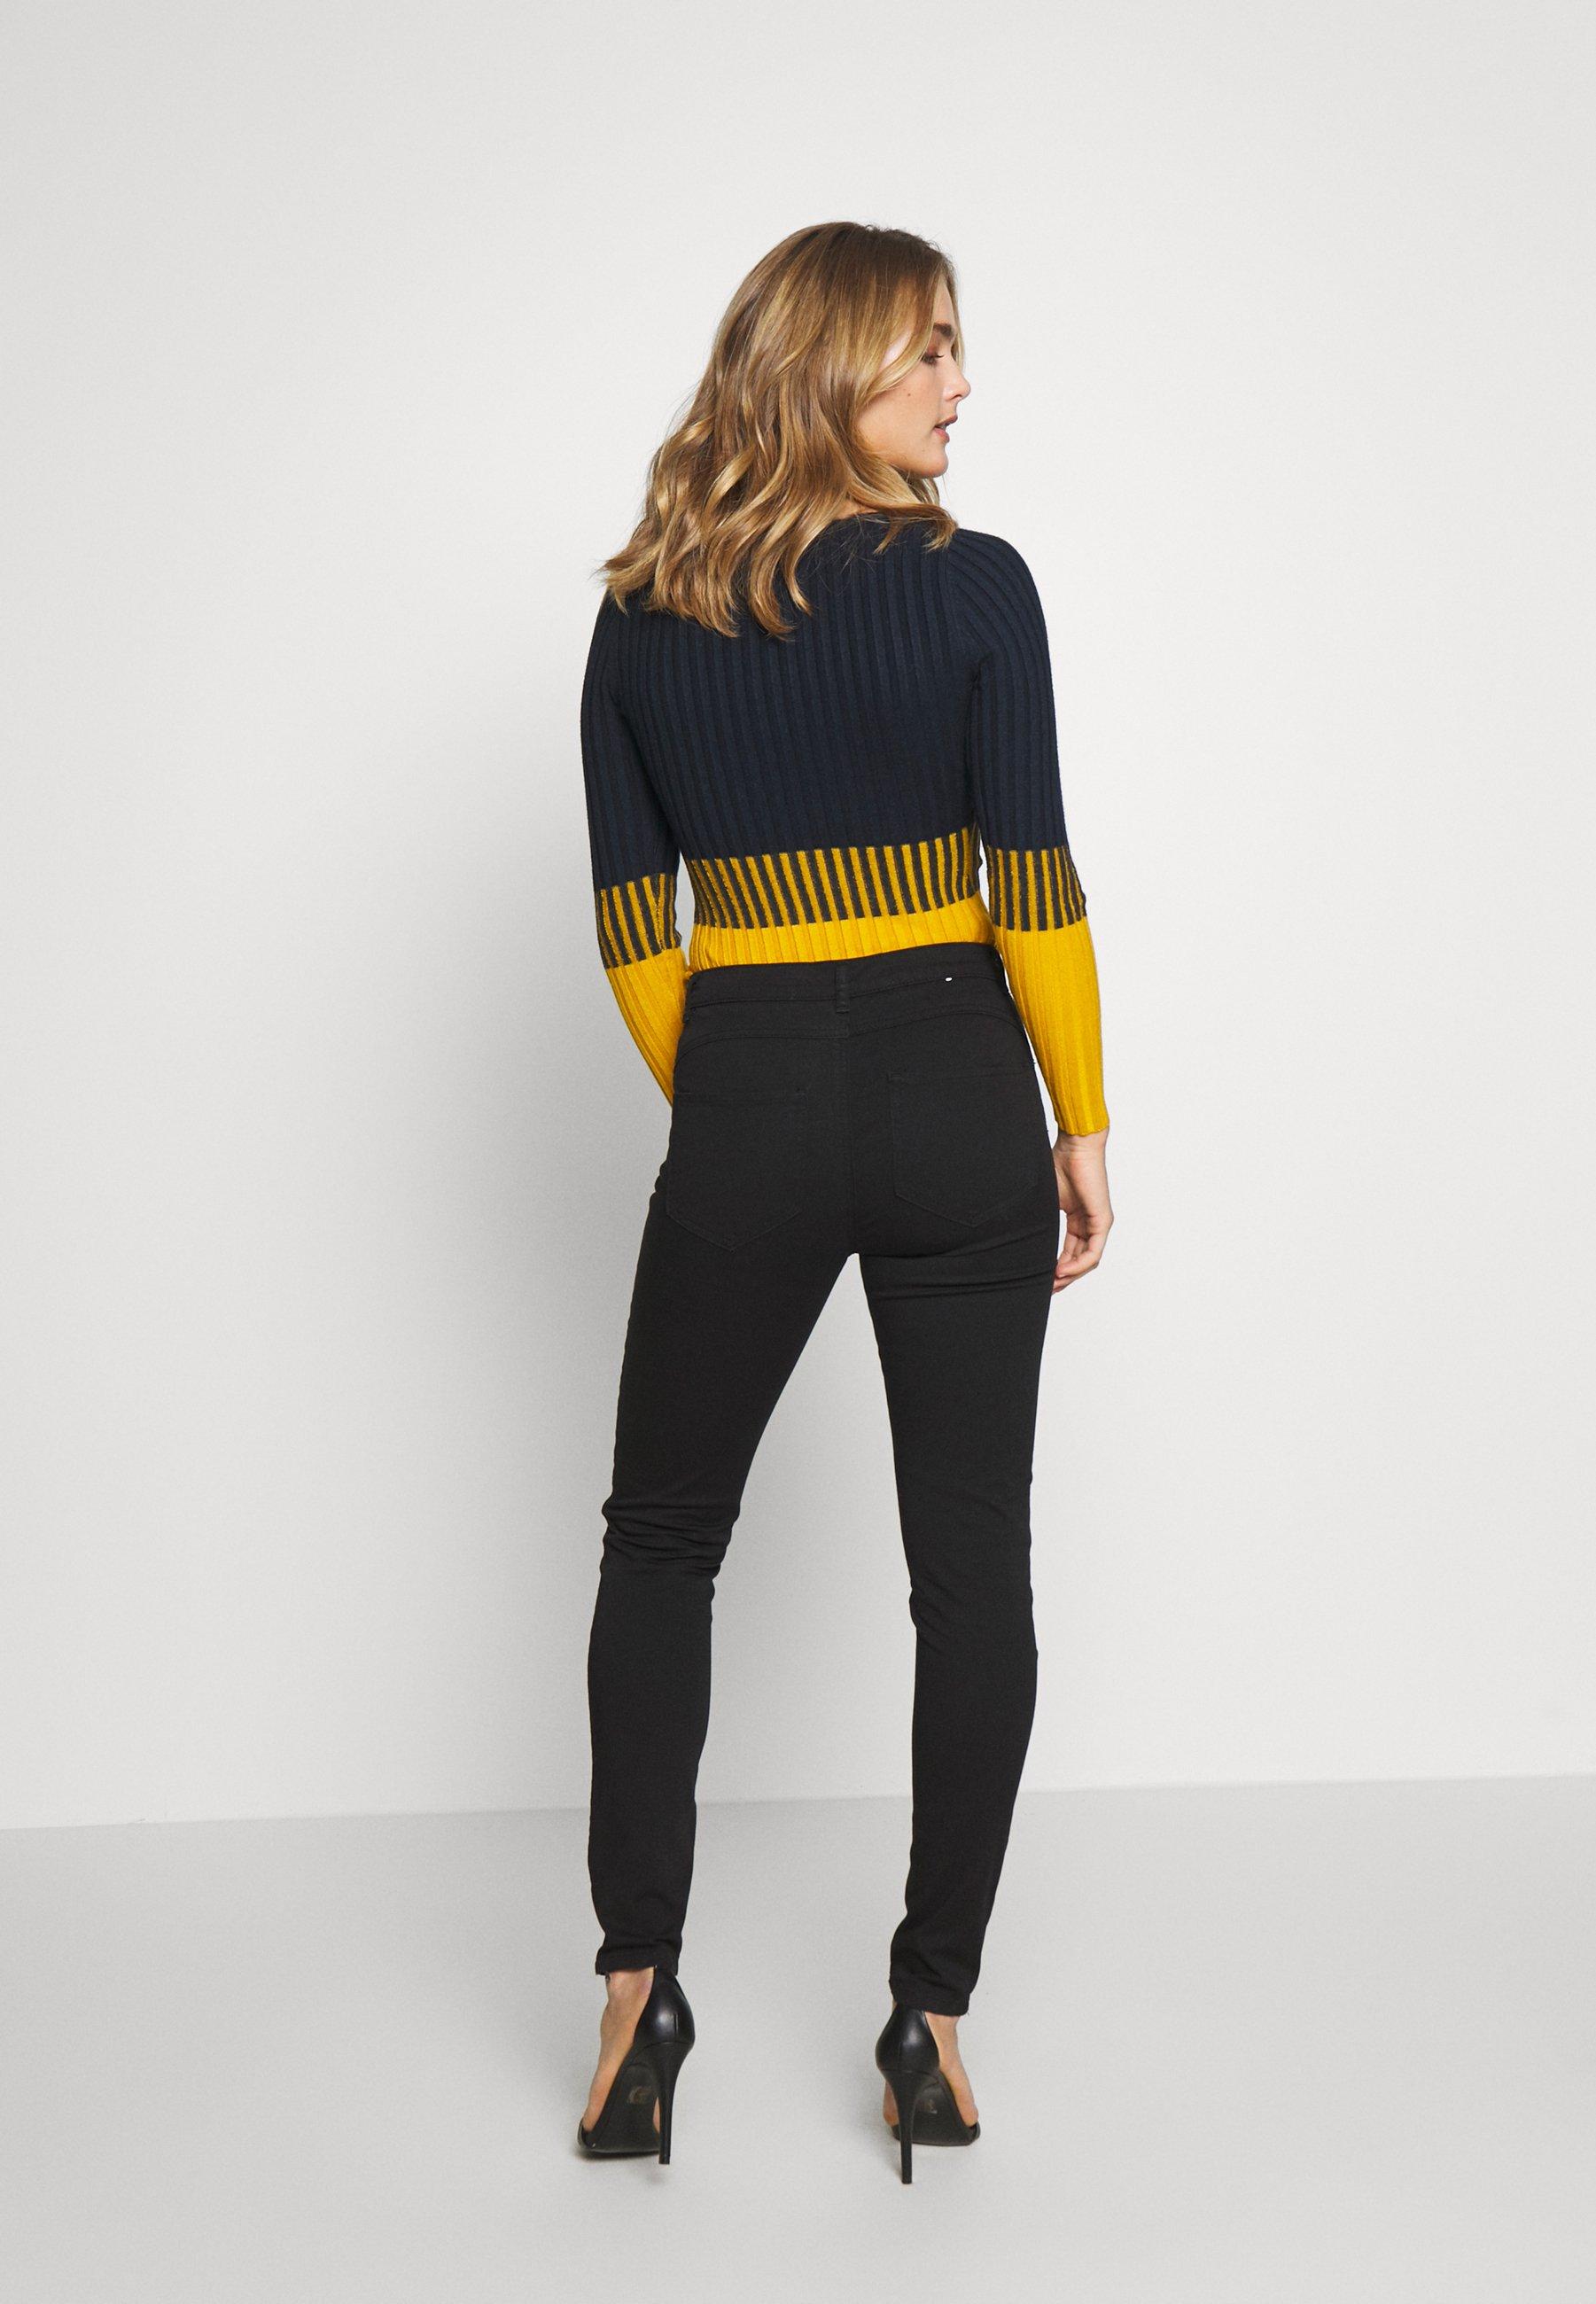 Benetton Trousers - Jeans Skinny Fit Black